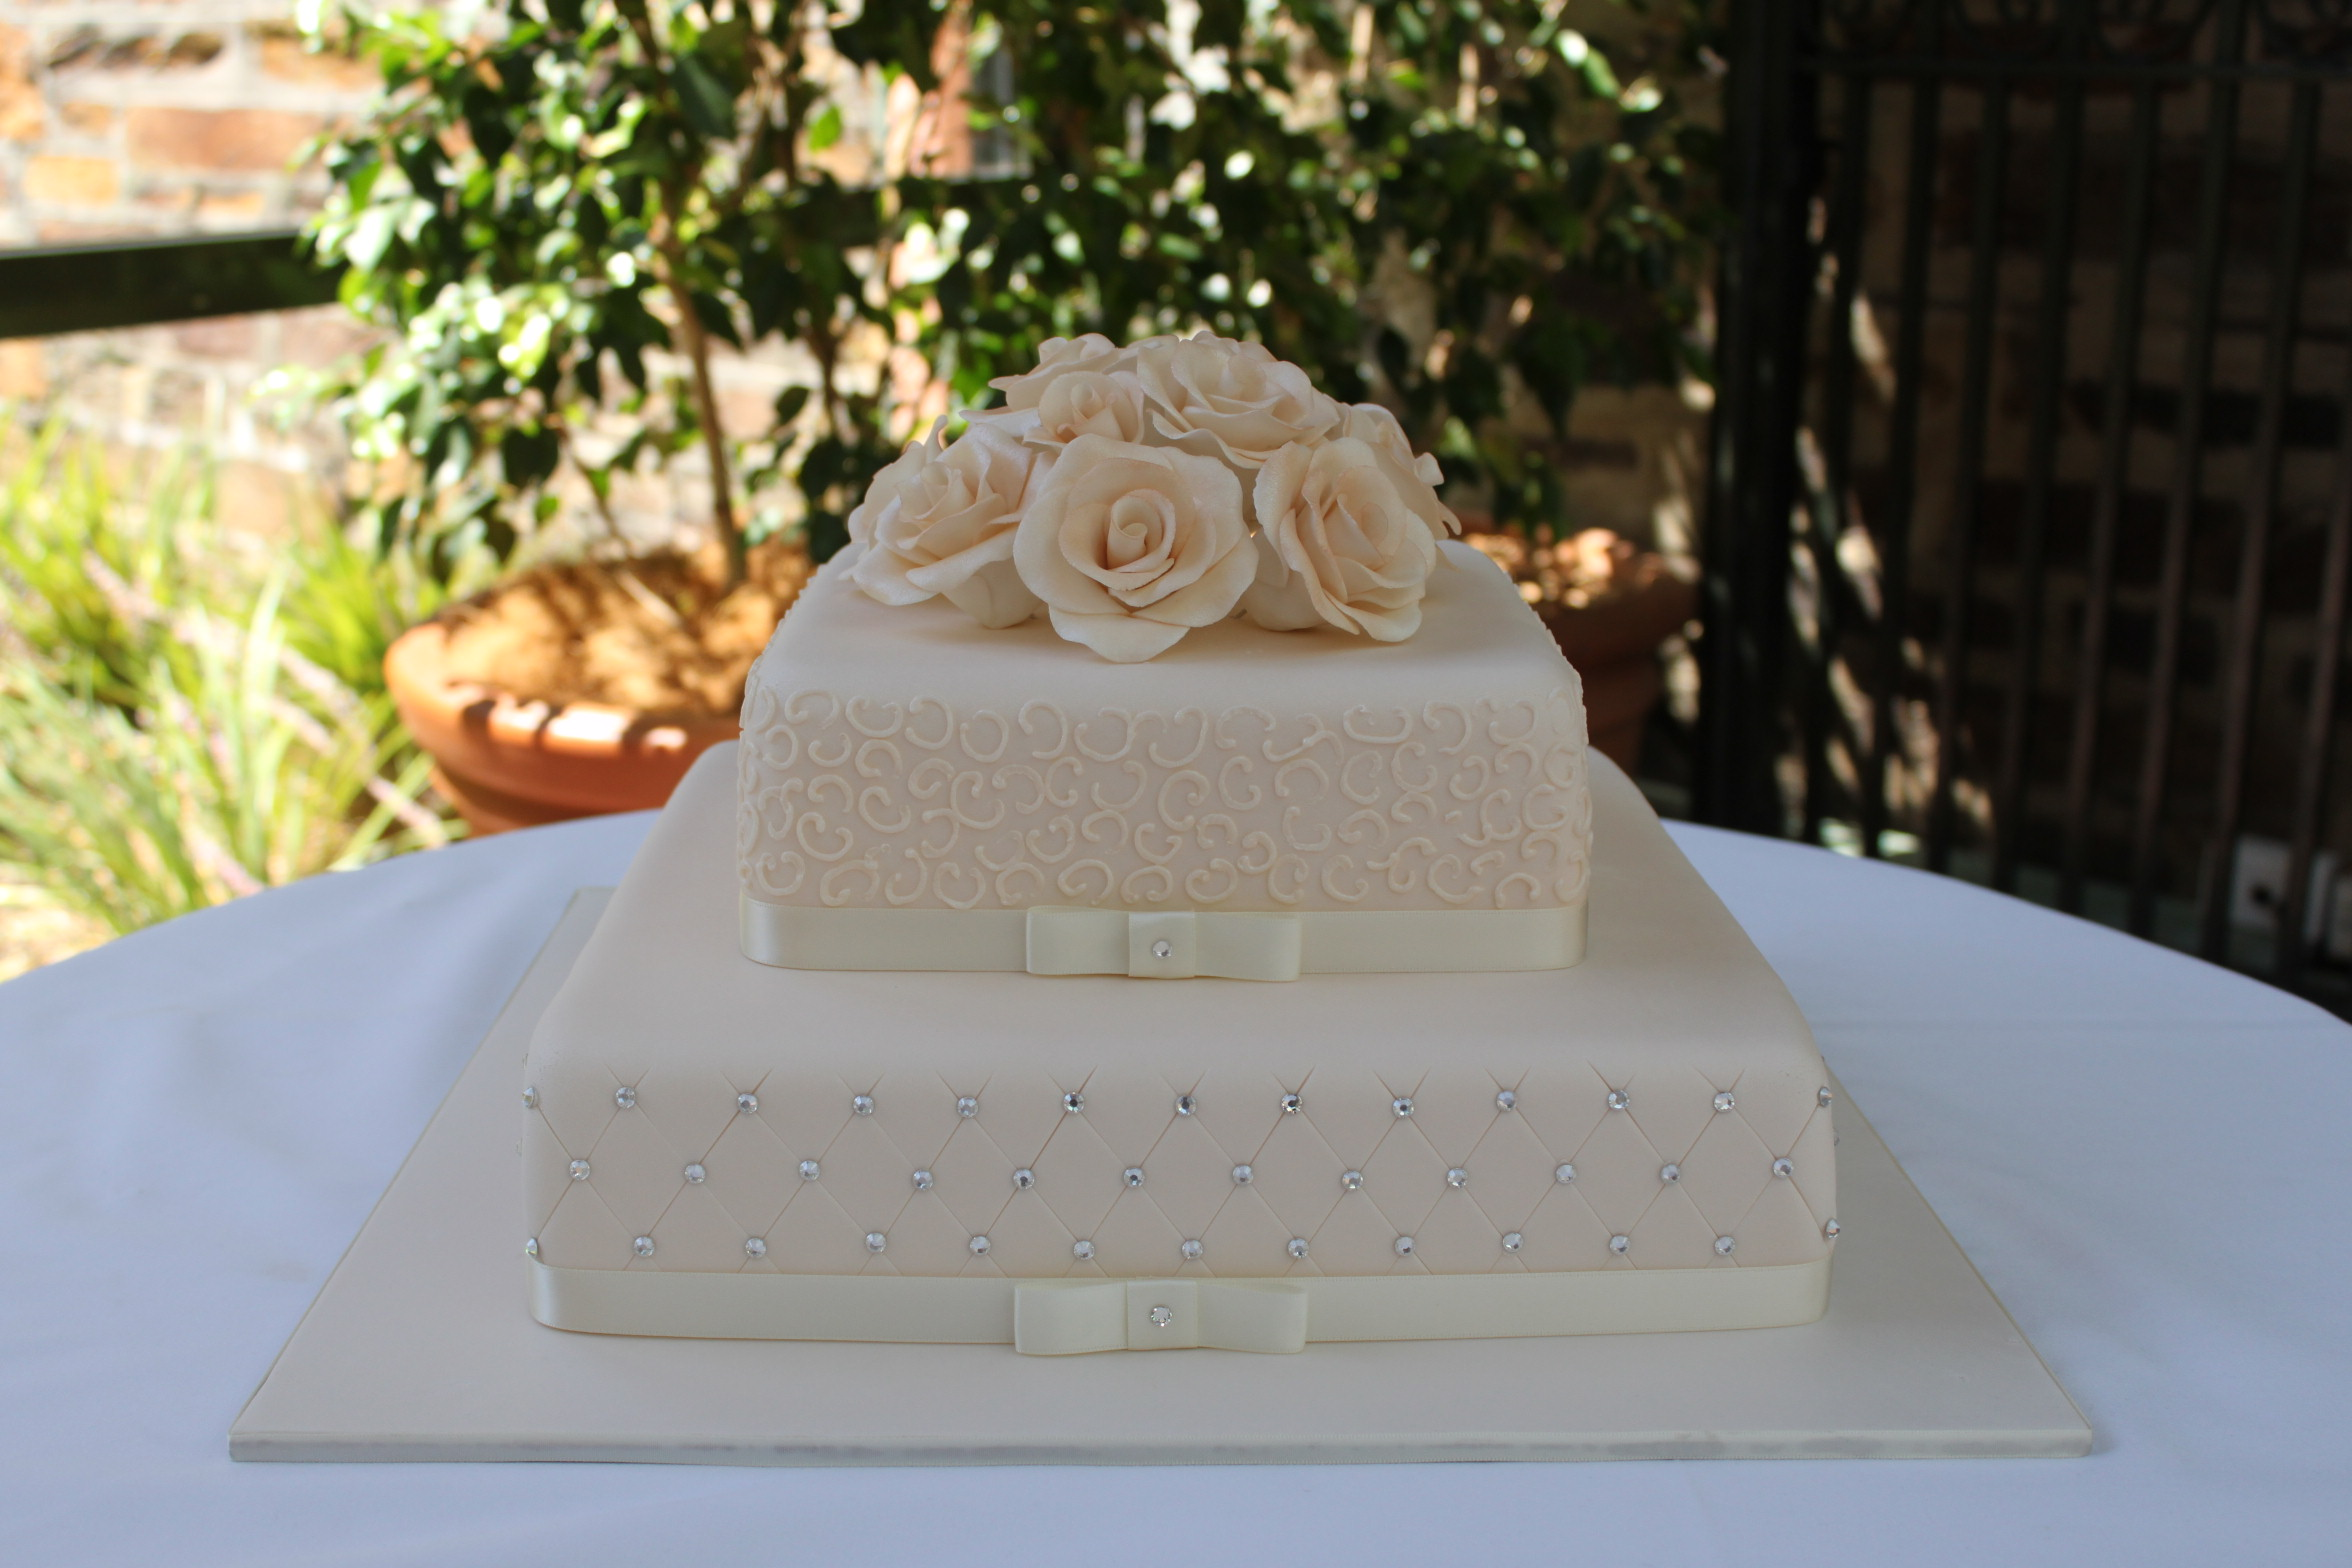 Cake Feature 2.jpg